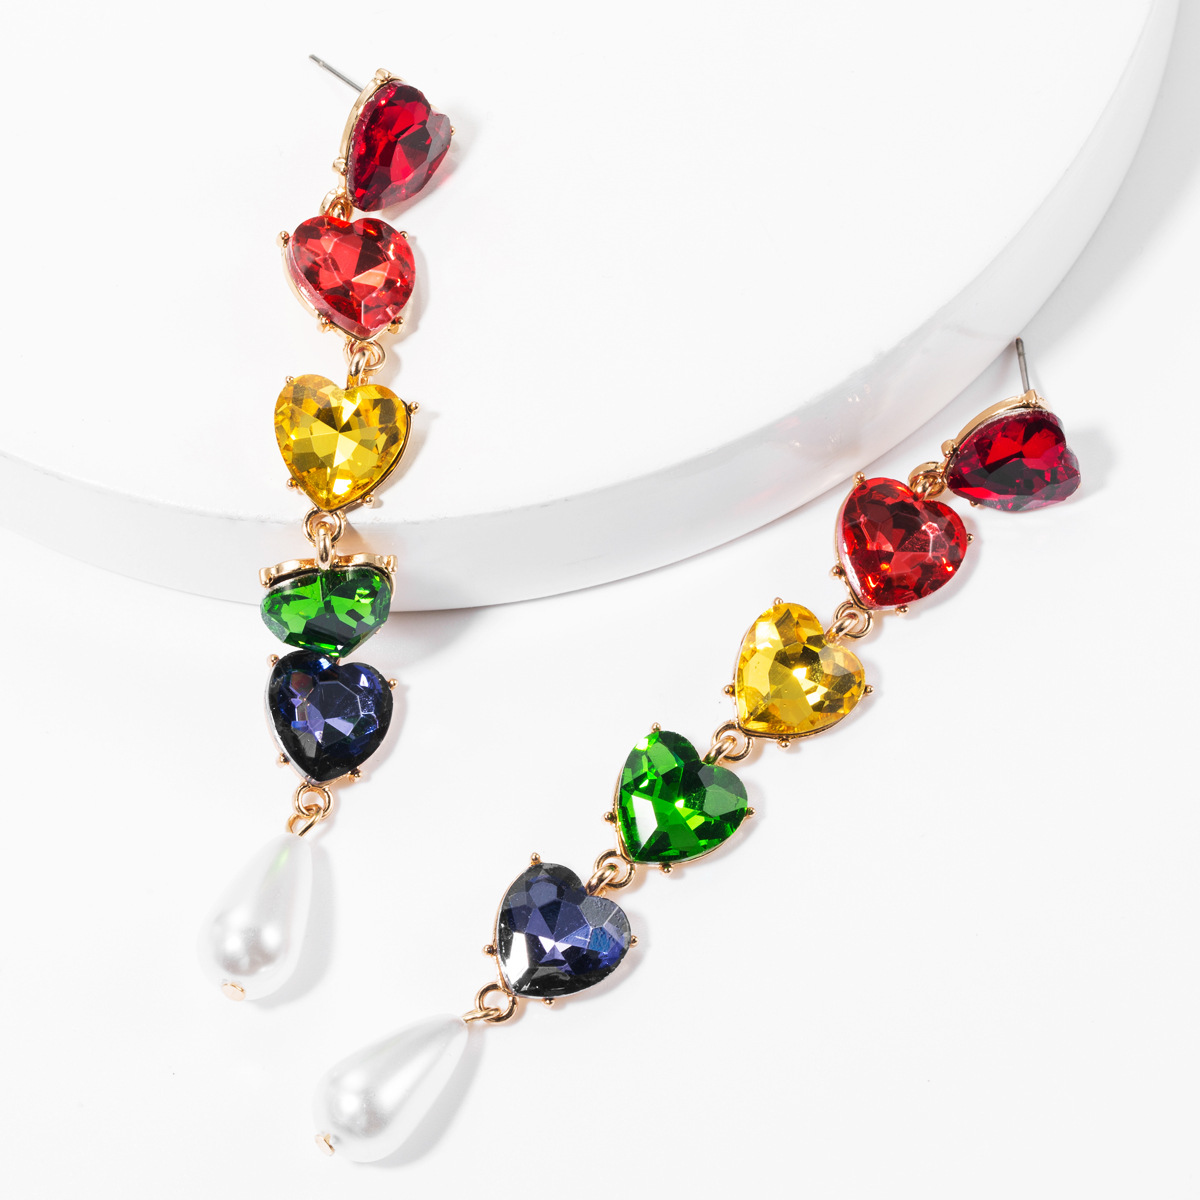 LUBOV Luxury Heart Tassel Drop Earrings Pendientes Largos Mujer Wedding Earrings Women Earings Drop Long Christams Gift